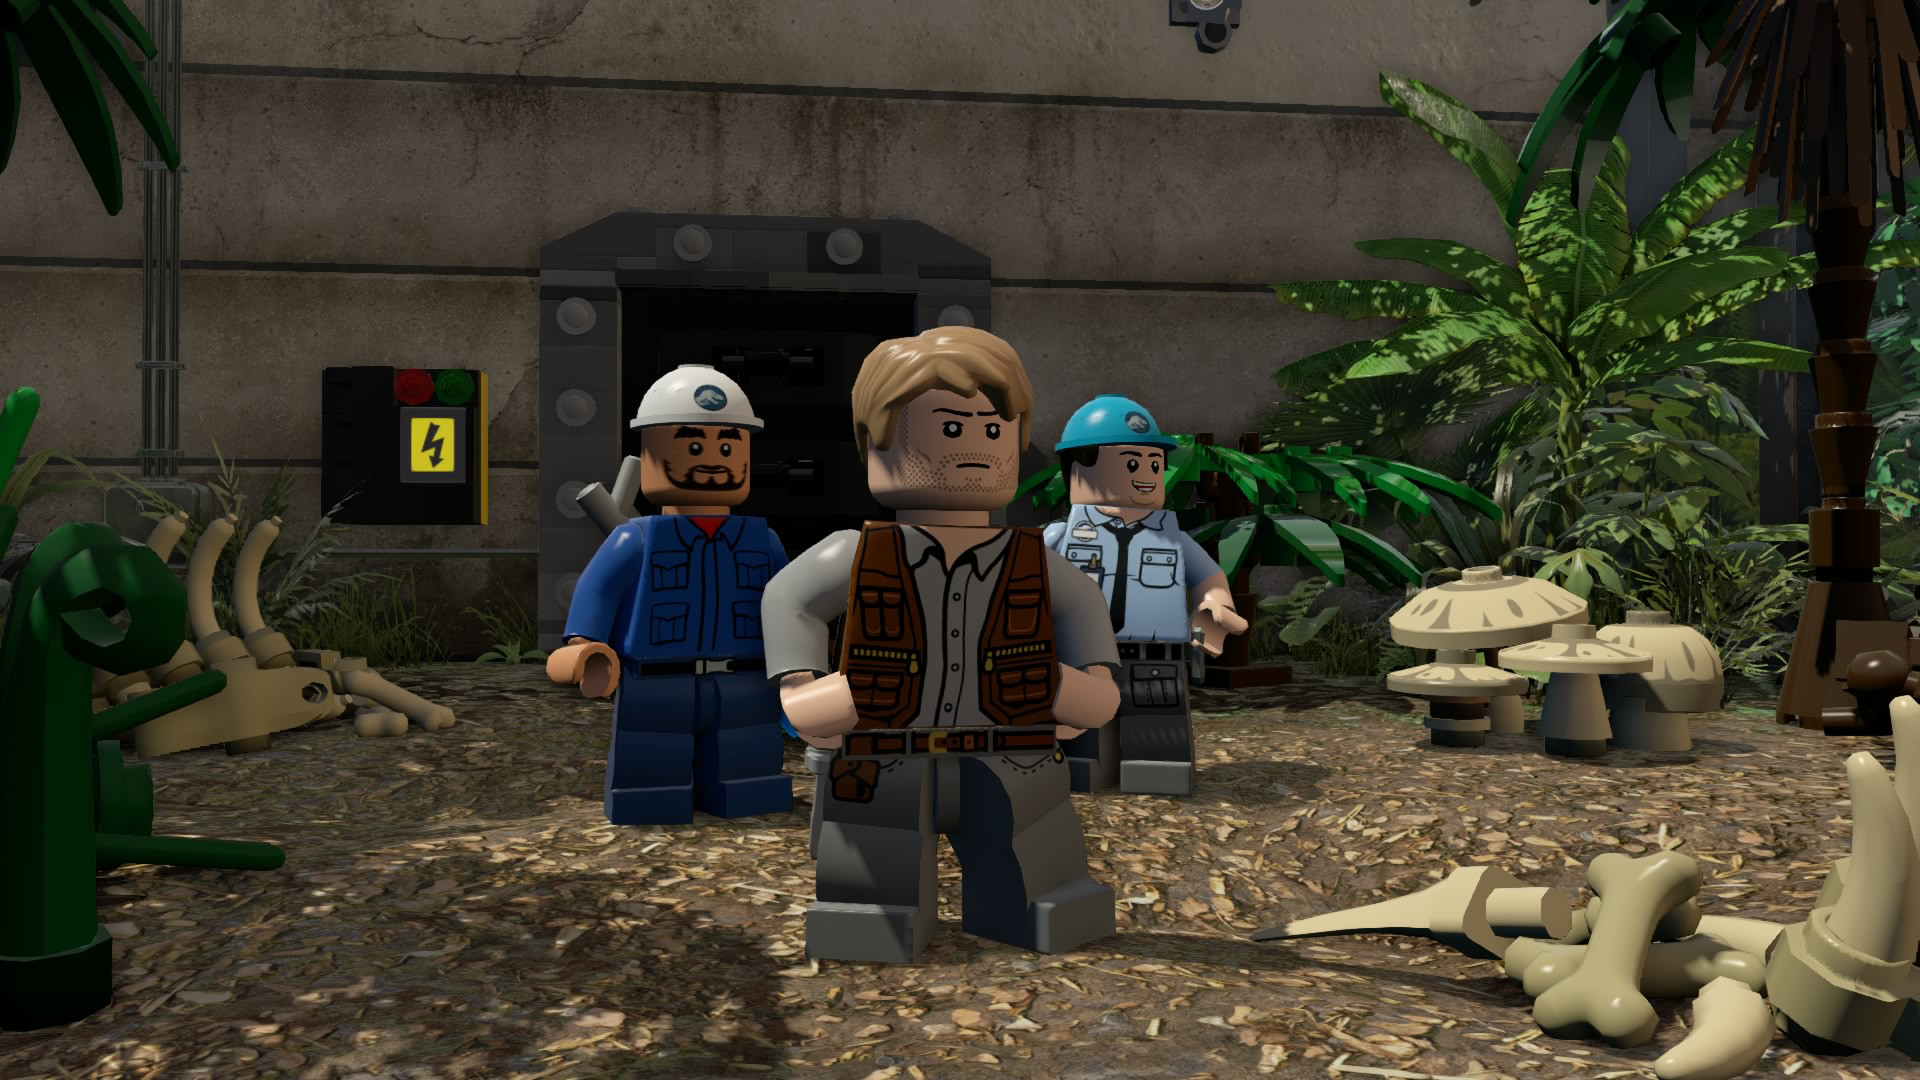 Lego Jurassic World On Steam